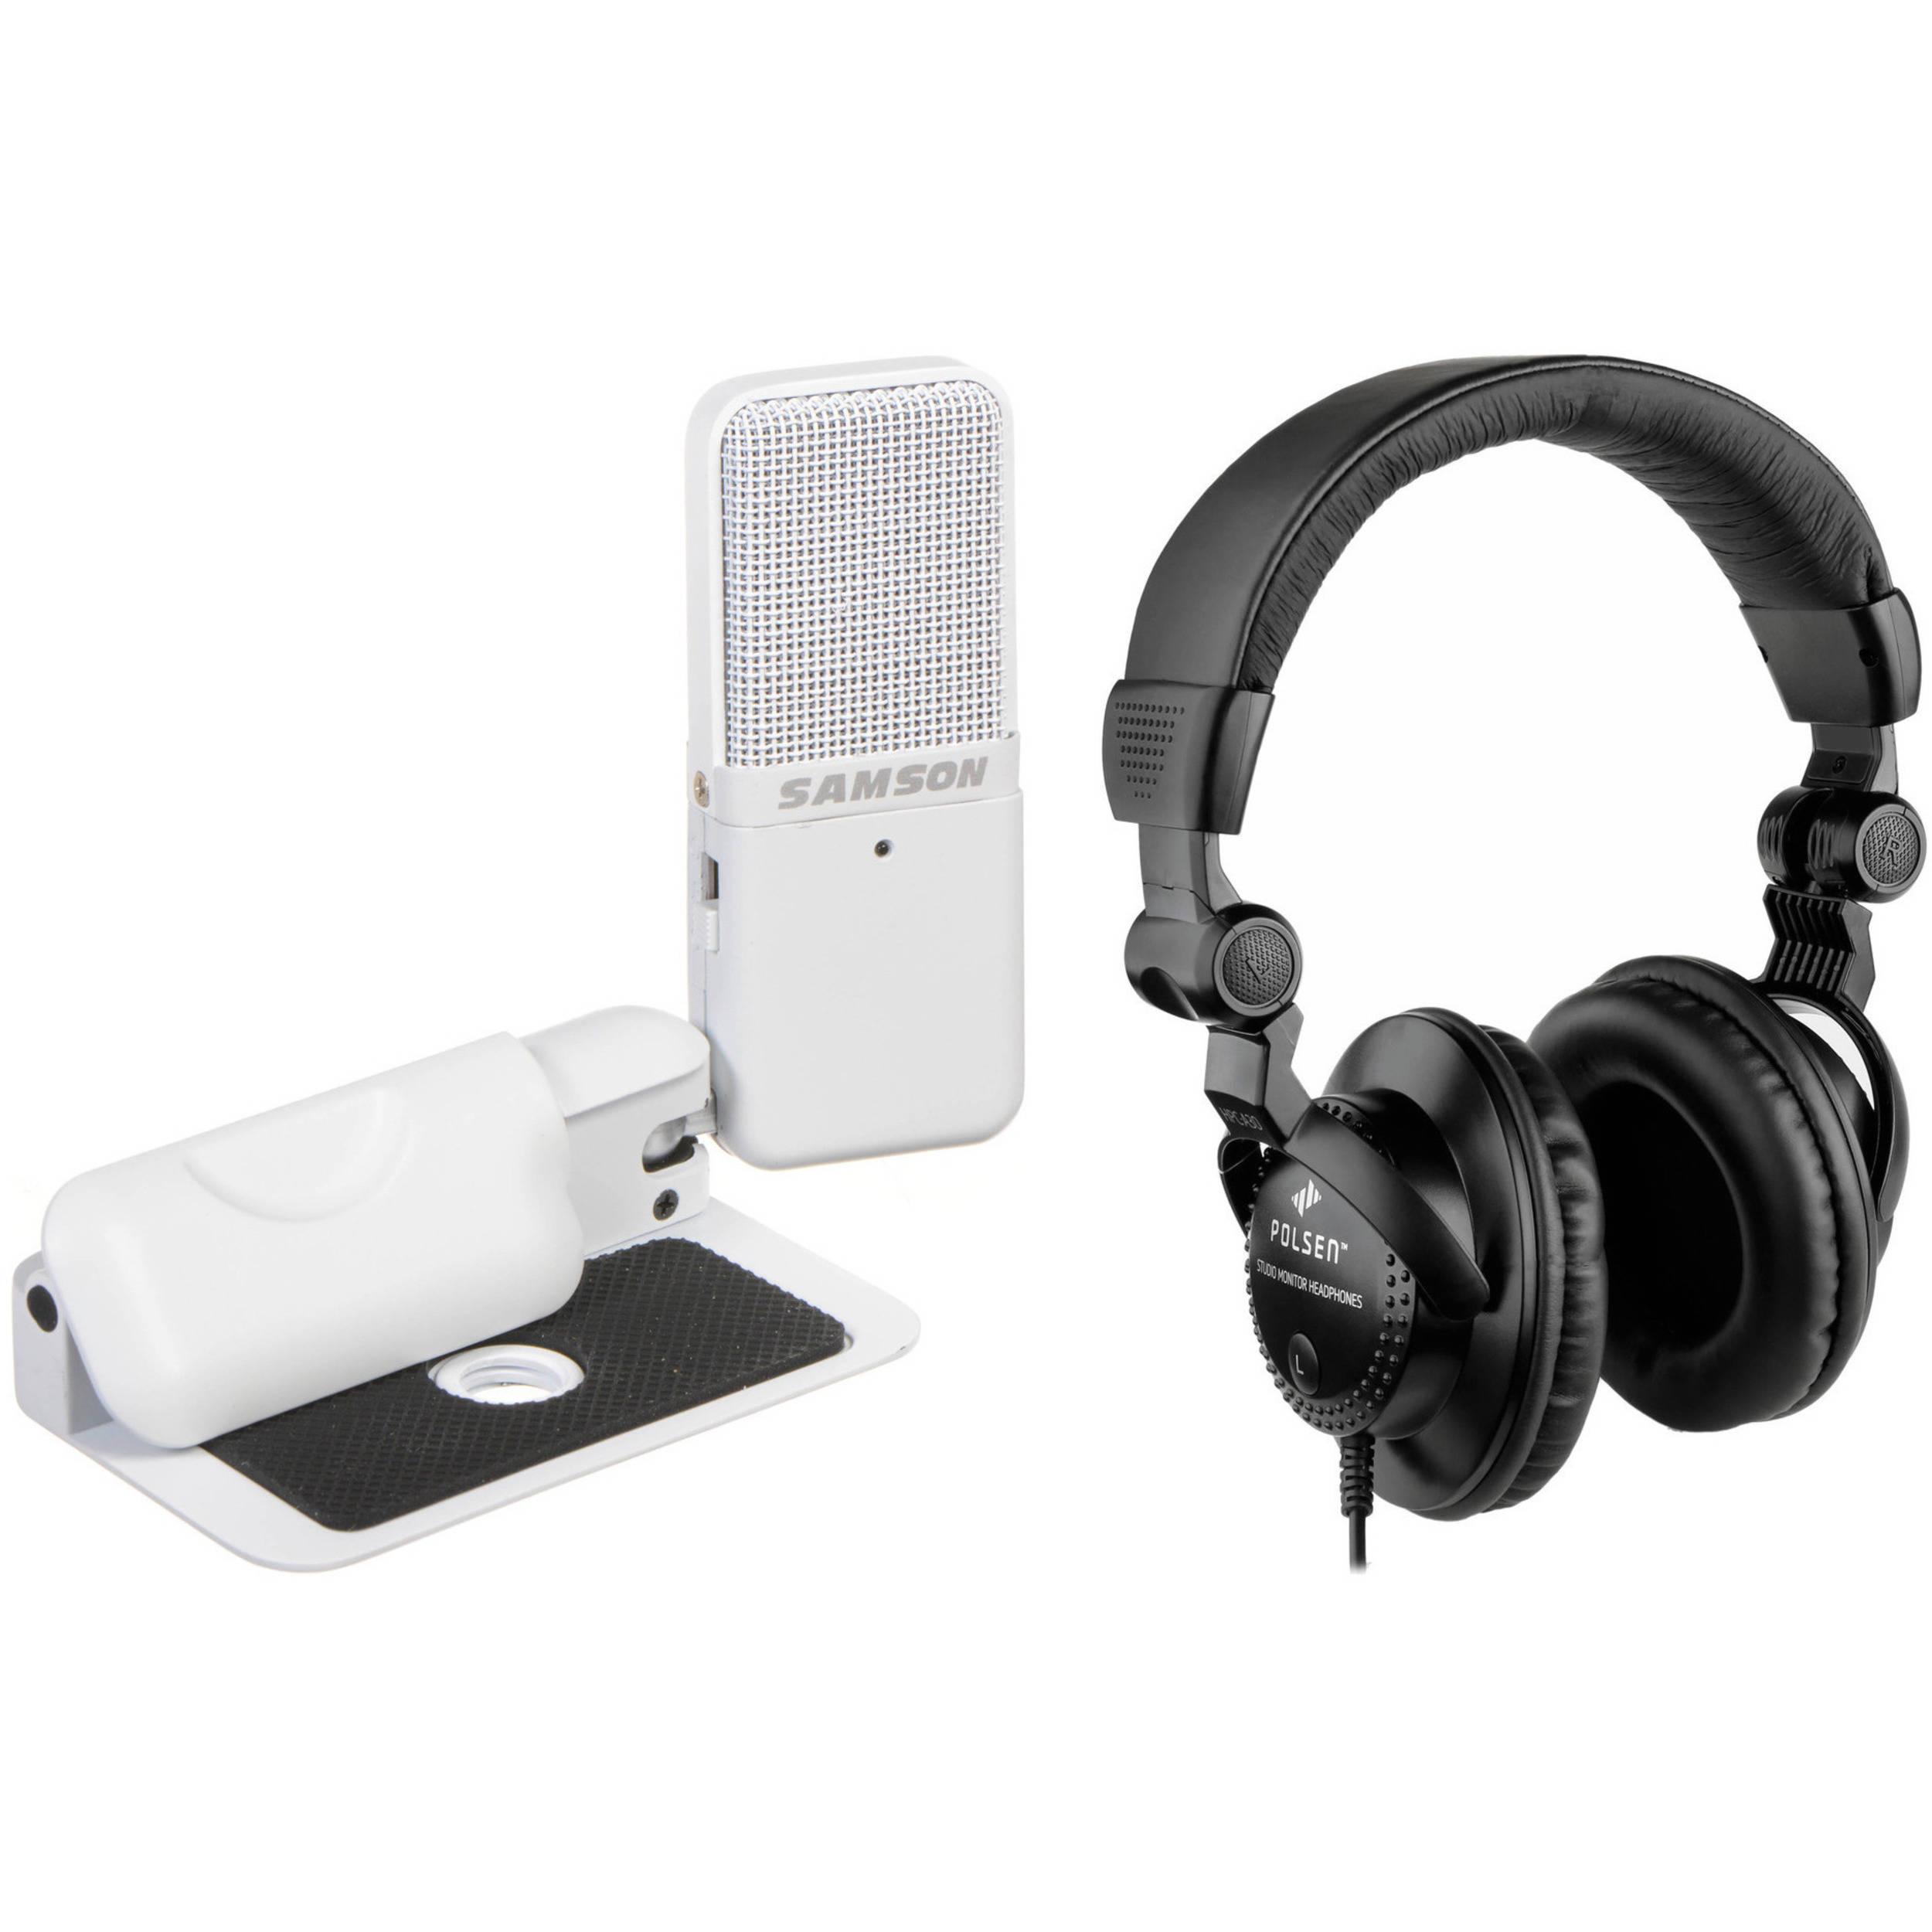 Microphone and dj headphones bundle - headphones with microphone apple